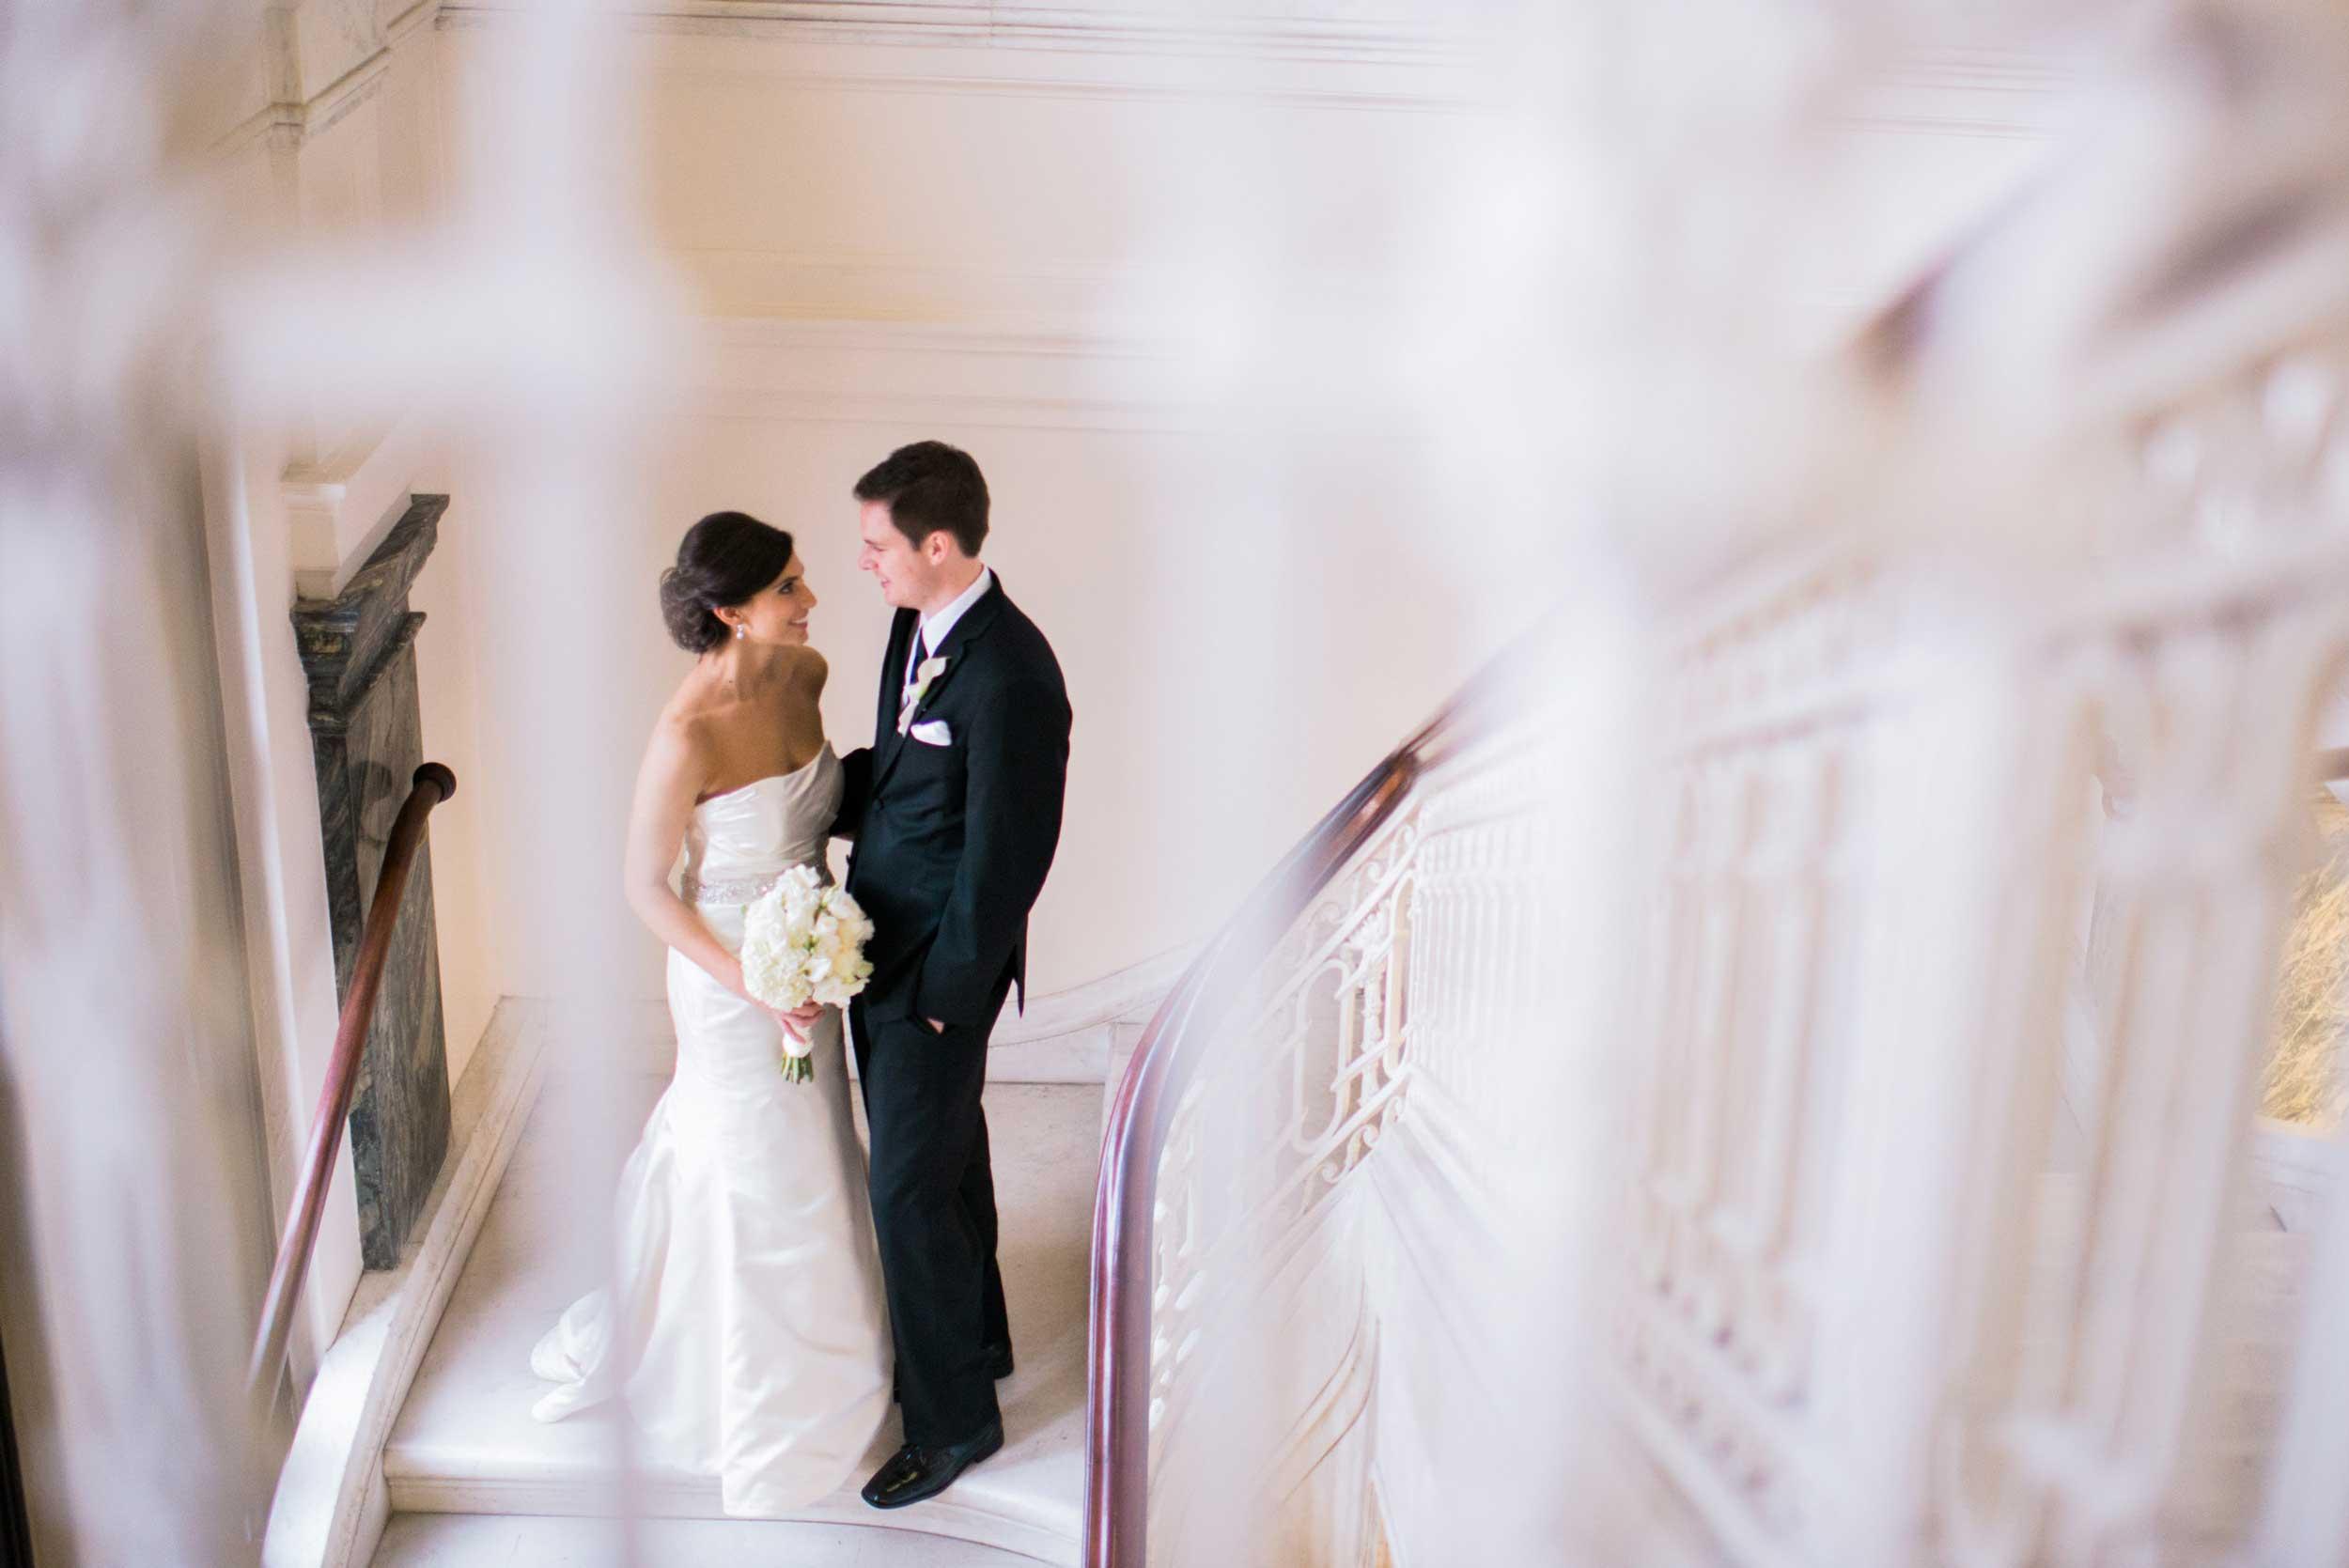 Wedding portrait at the Columbus Metropolitan Library in Columbus, OH